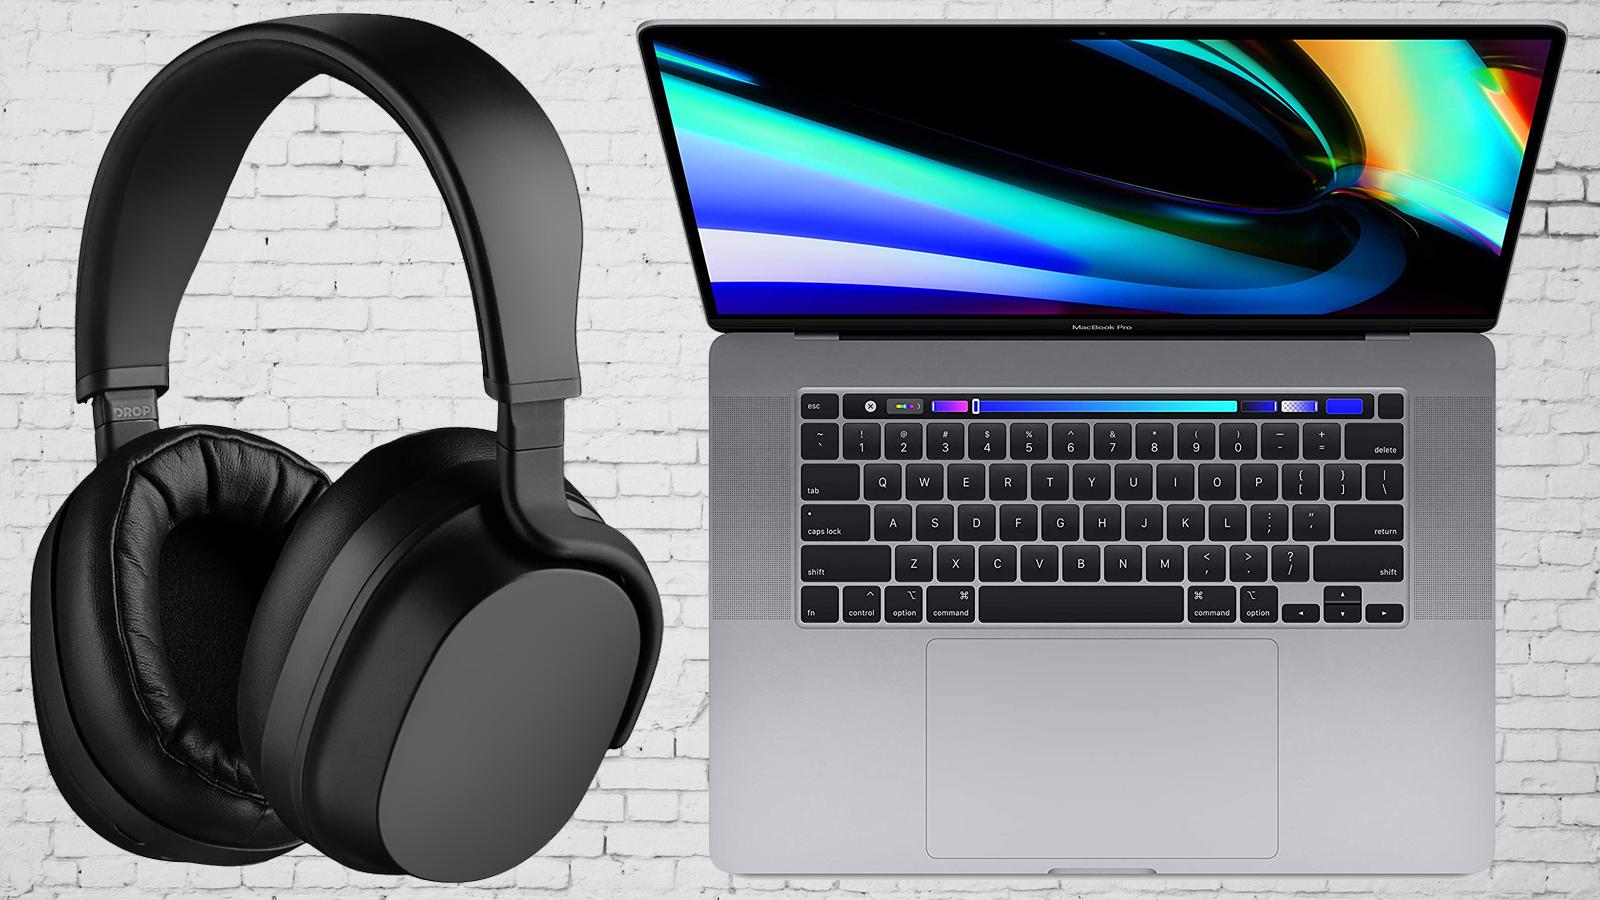 16-inch Apple MacBook Pro and Drop + THX Panda wireless headphones against white brick background